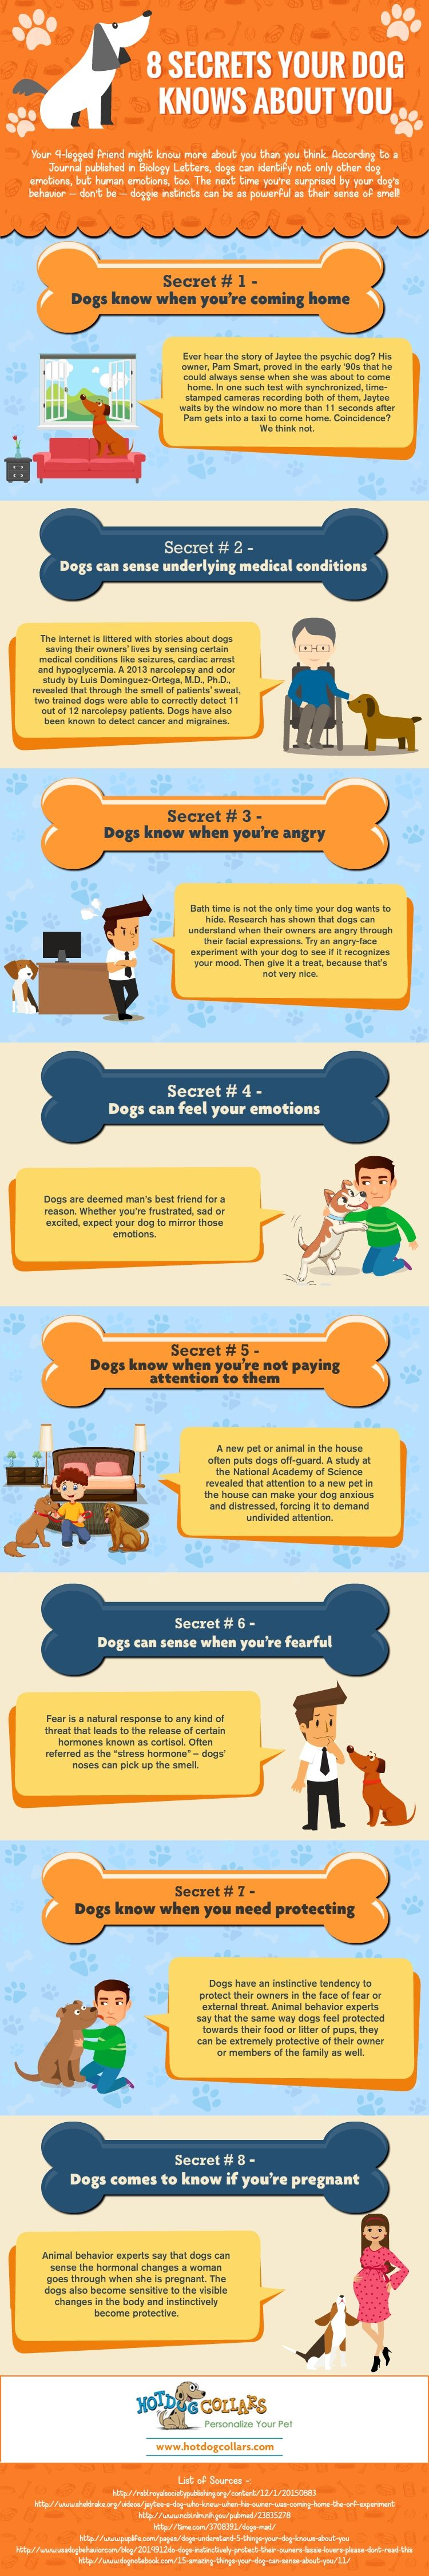 Secrets your dog knows